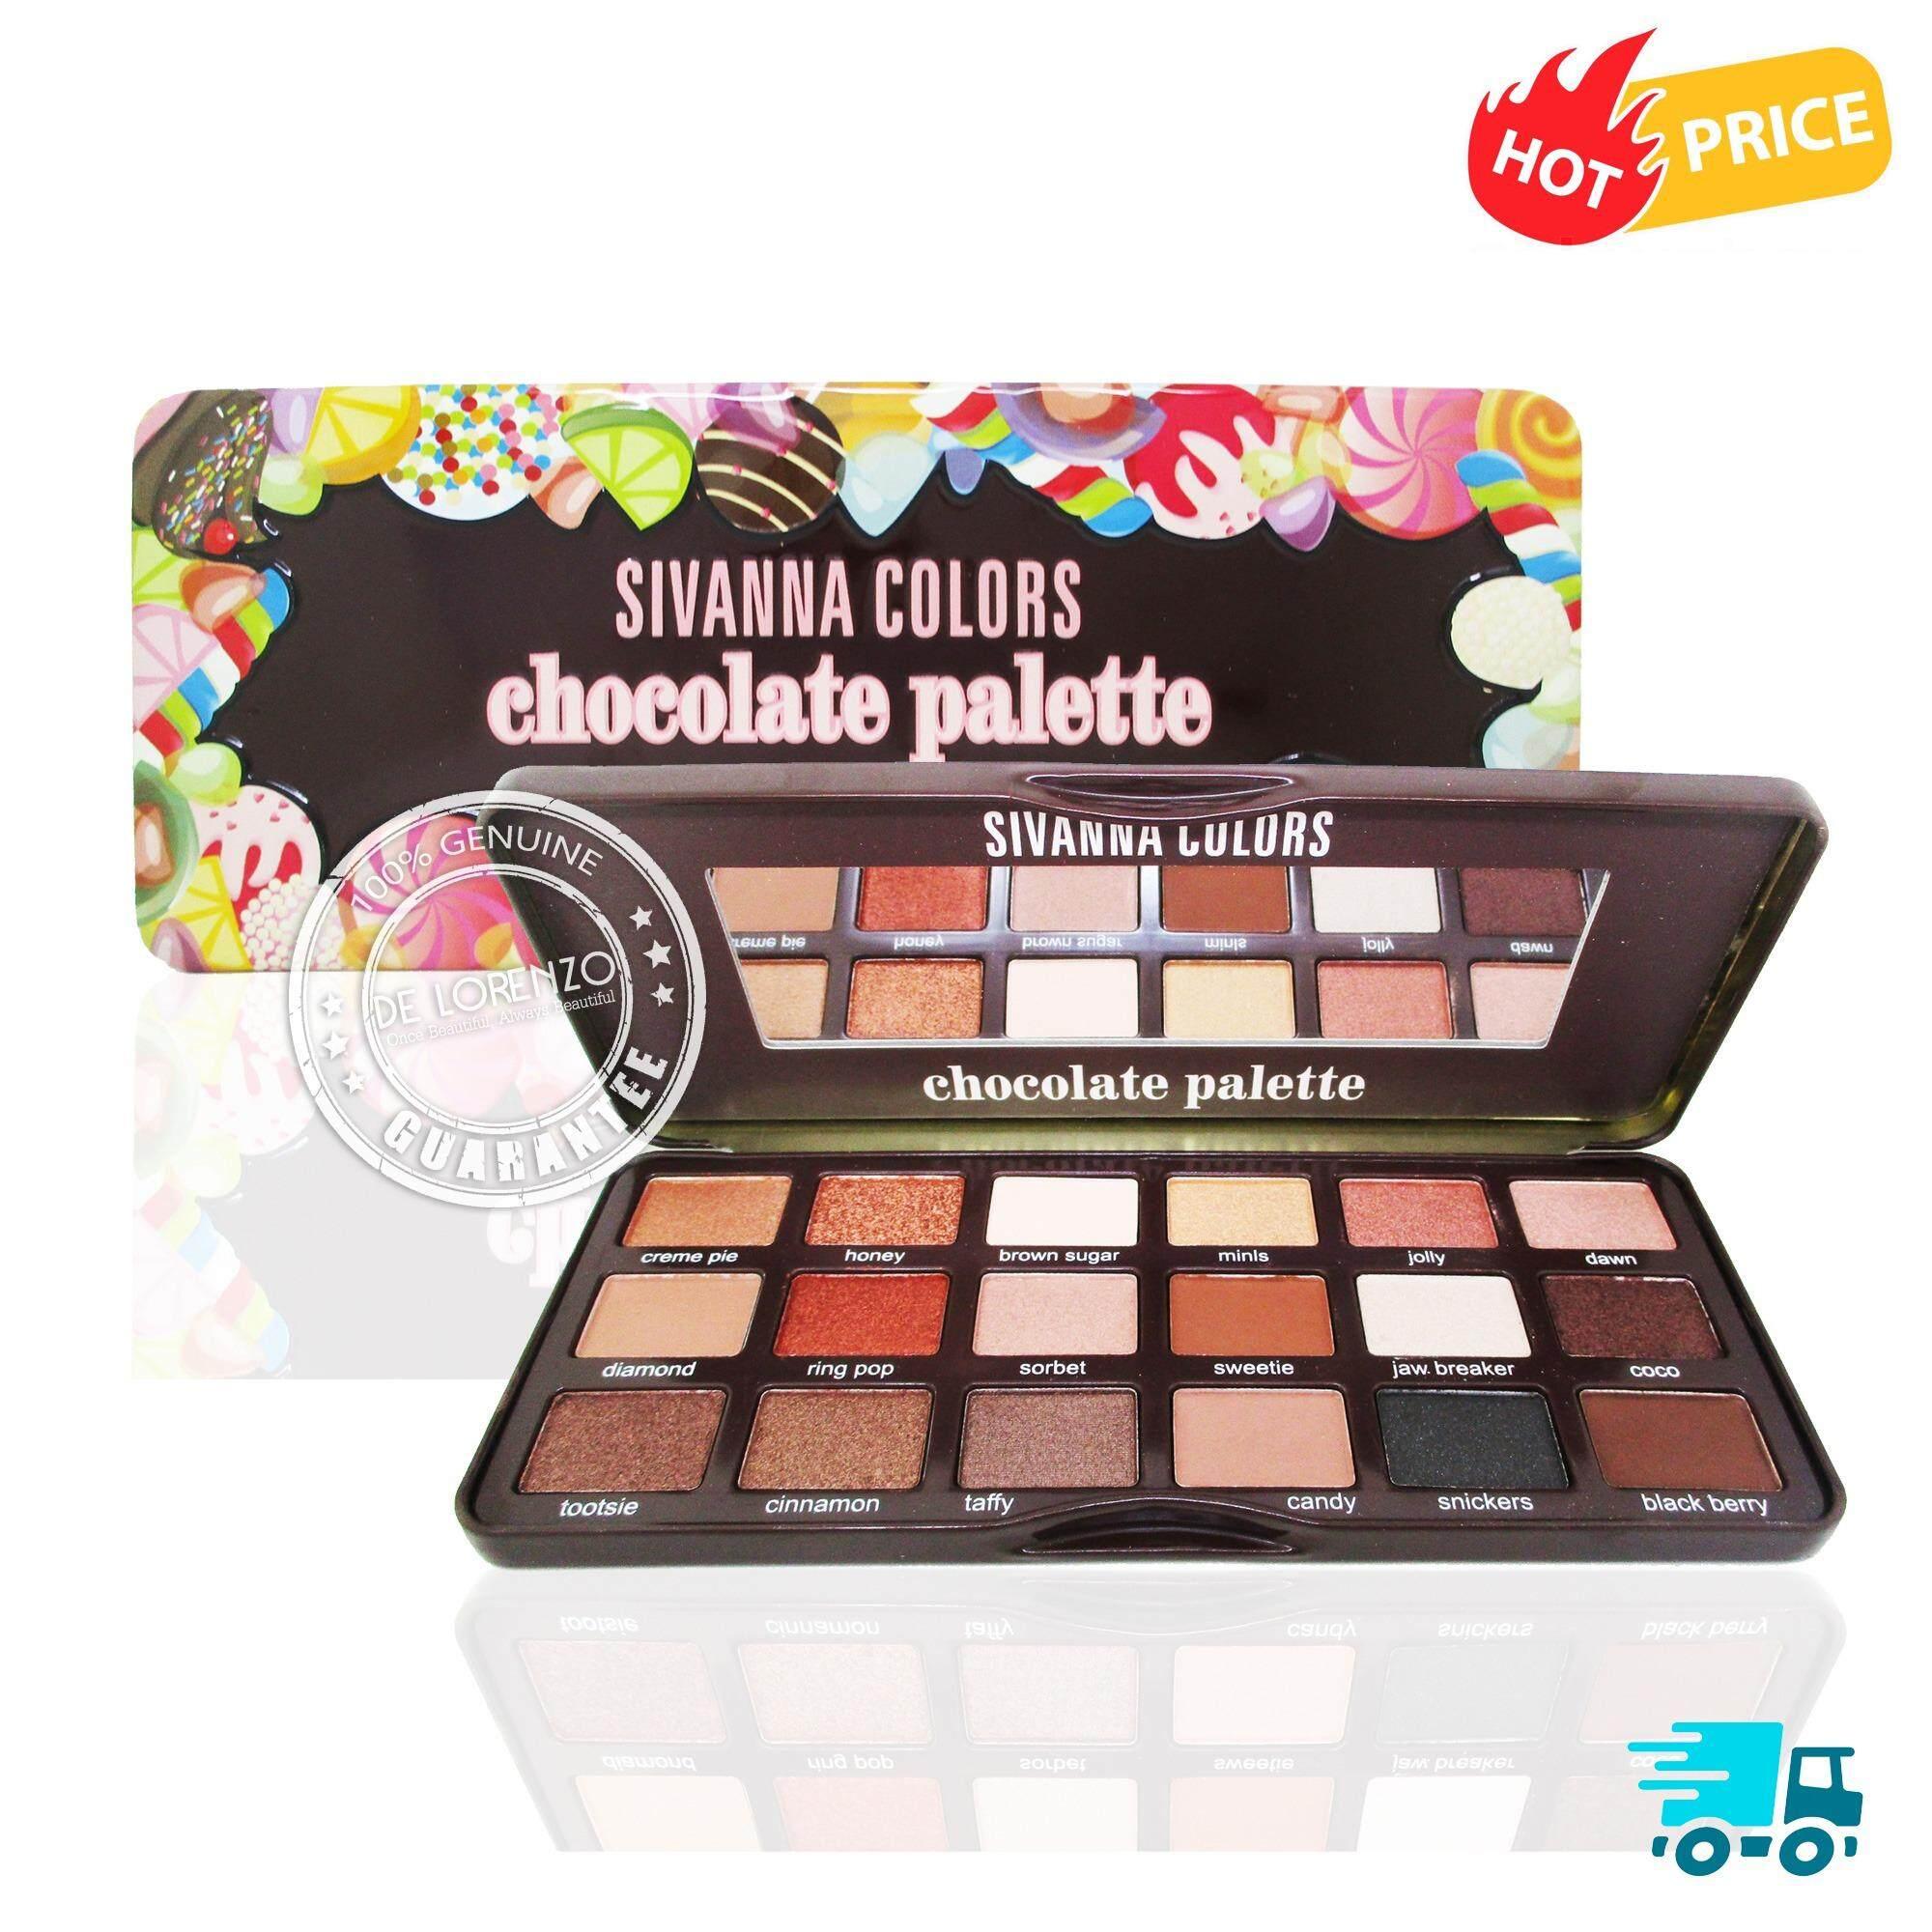 Sivanna Colors Eyeshadow Palette Hf7006 ซีเวียน่า อายแชโดว์พาเลท พาเลทแต่งตา 18สี เป็นต้นฉบับ